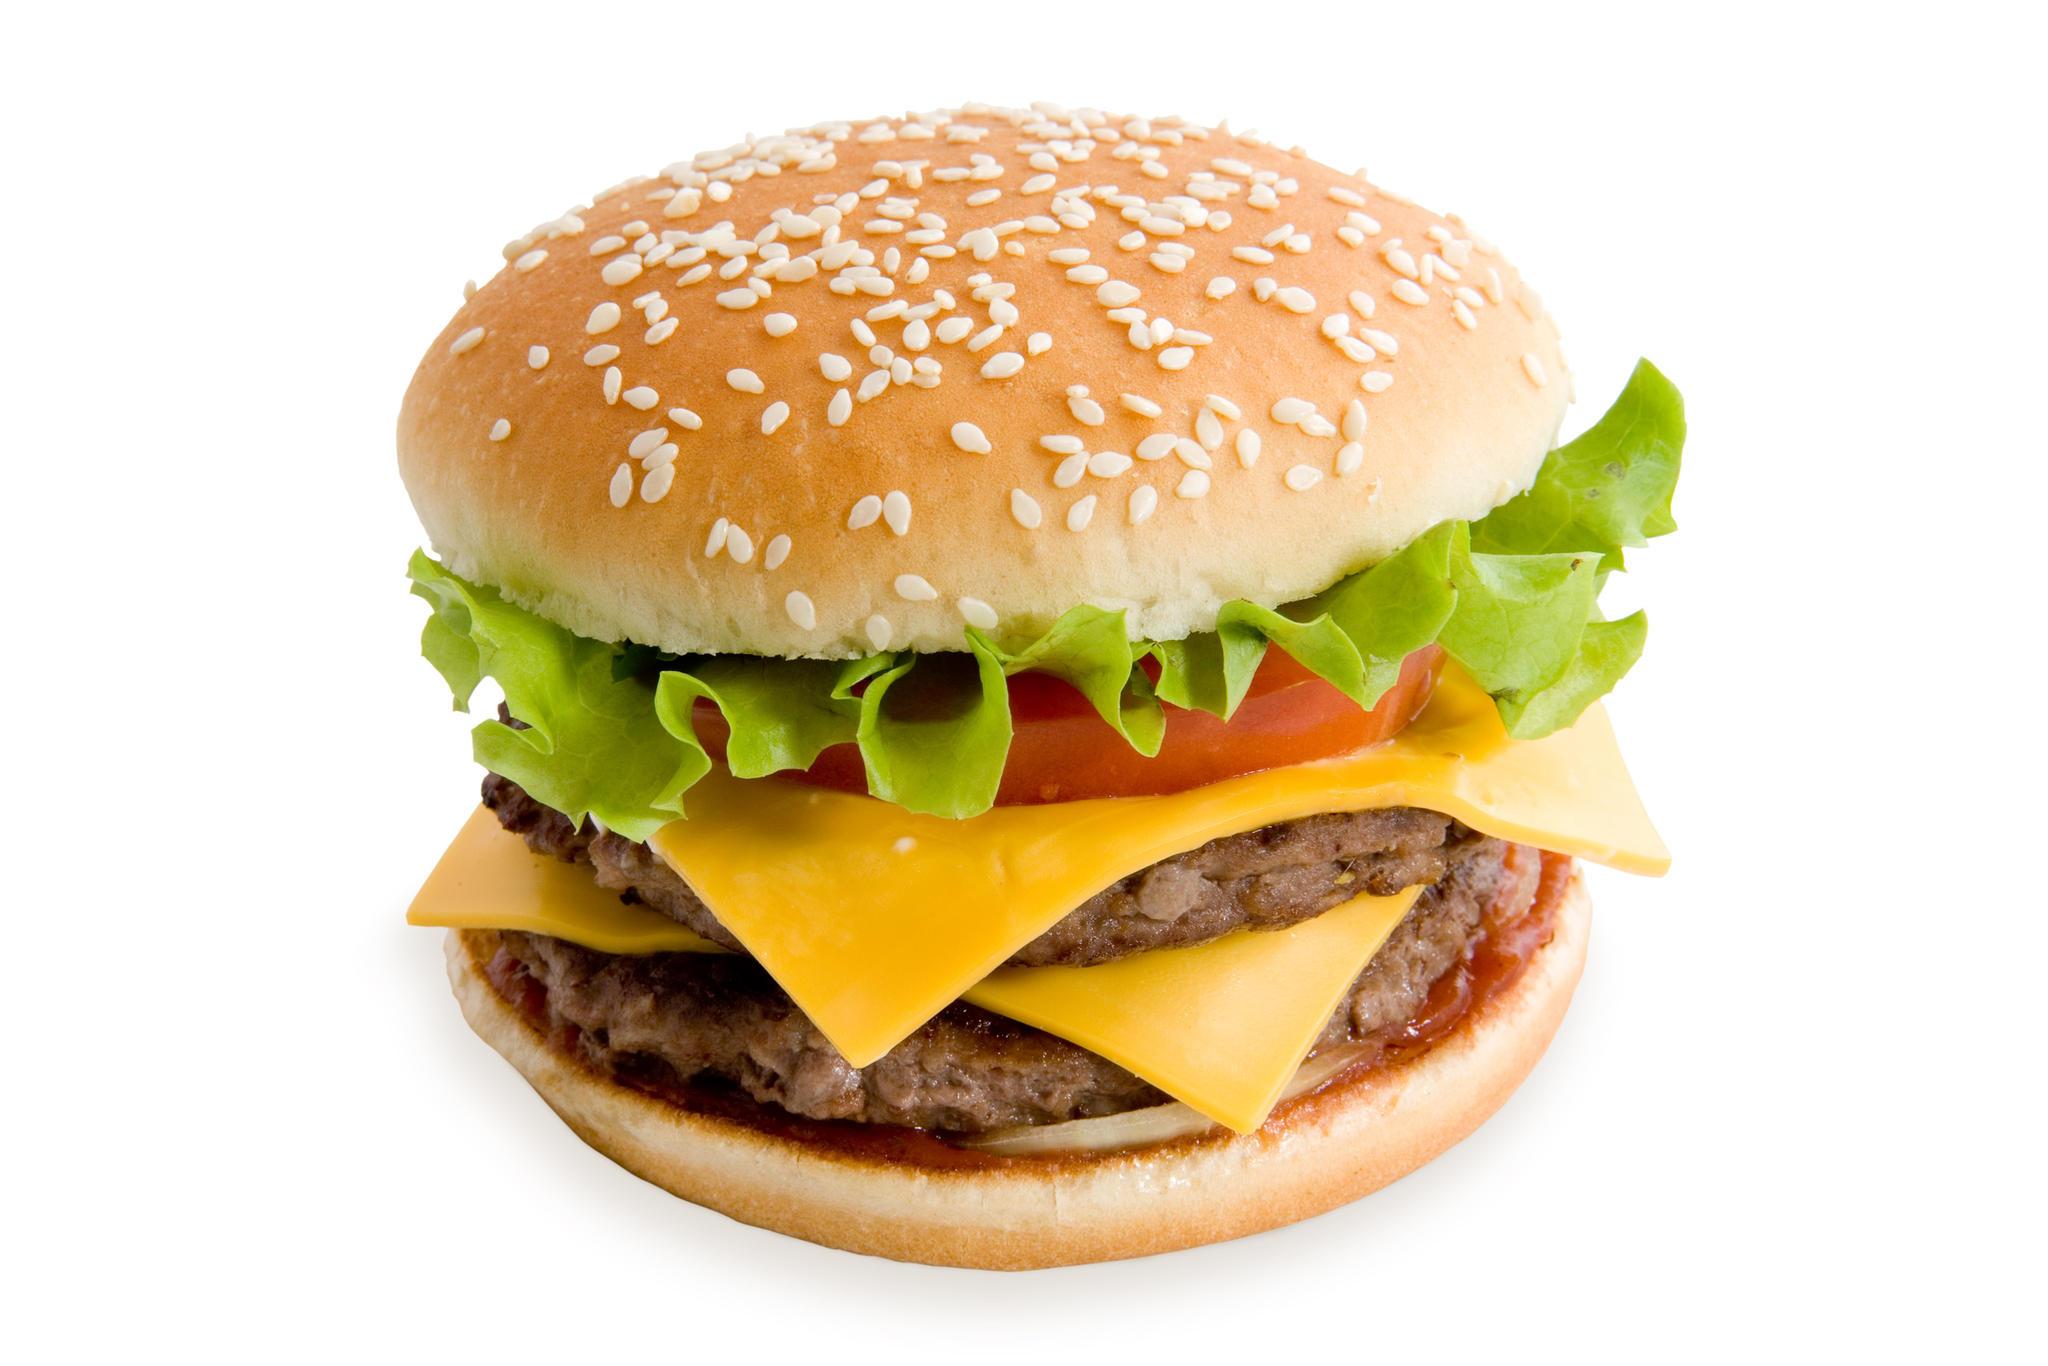 imageshamburger-6.jpg